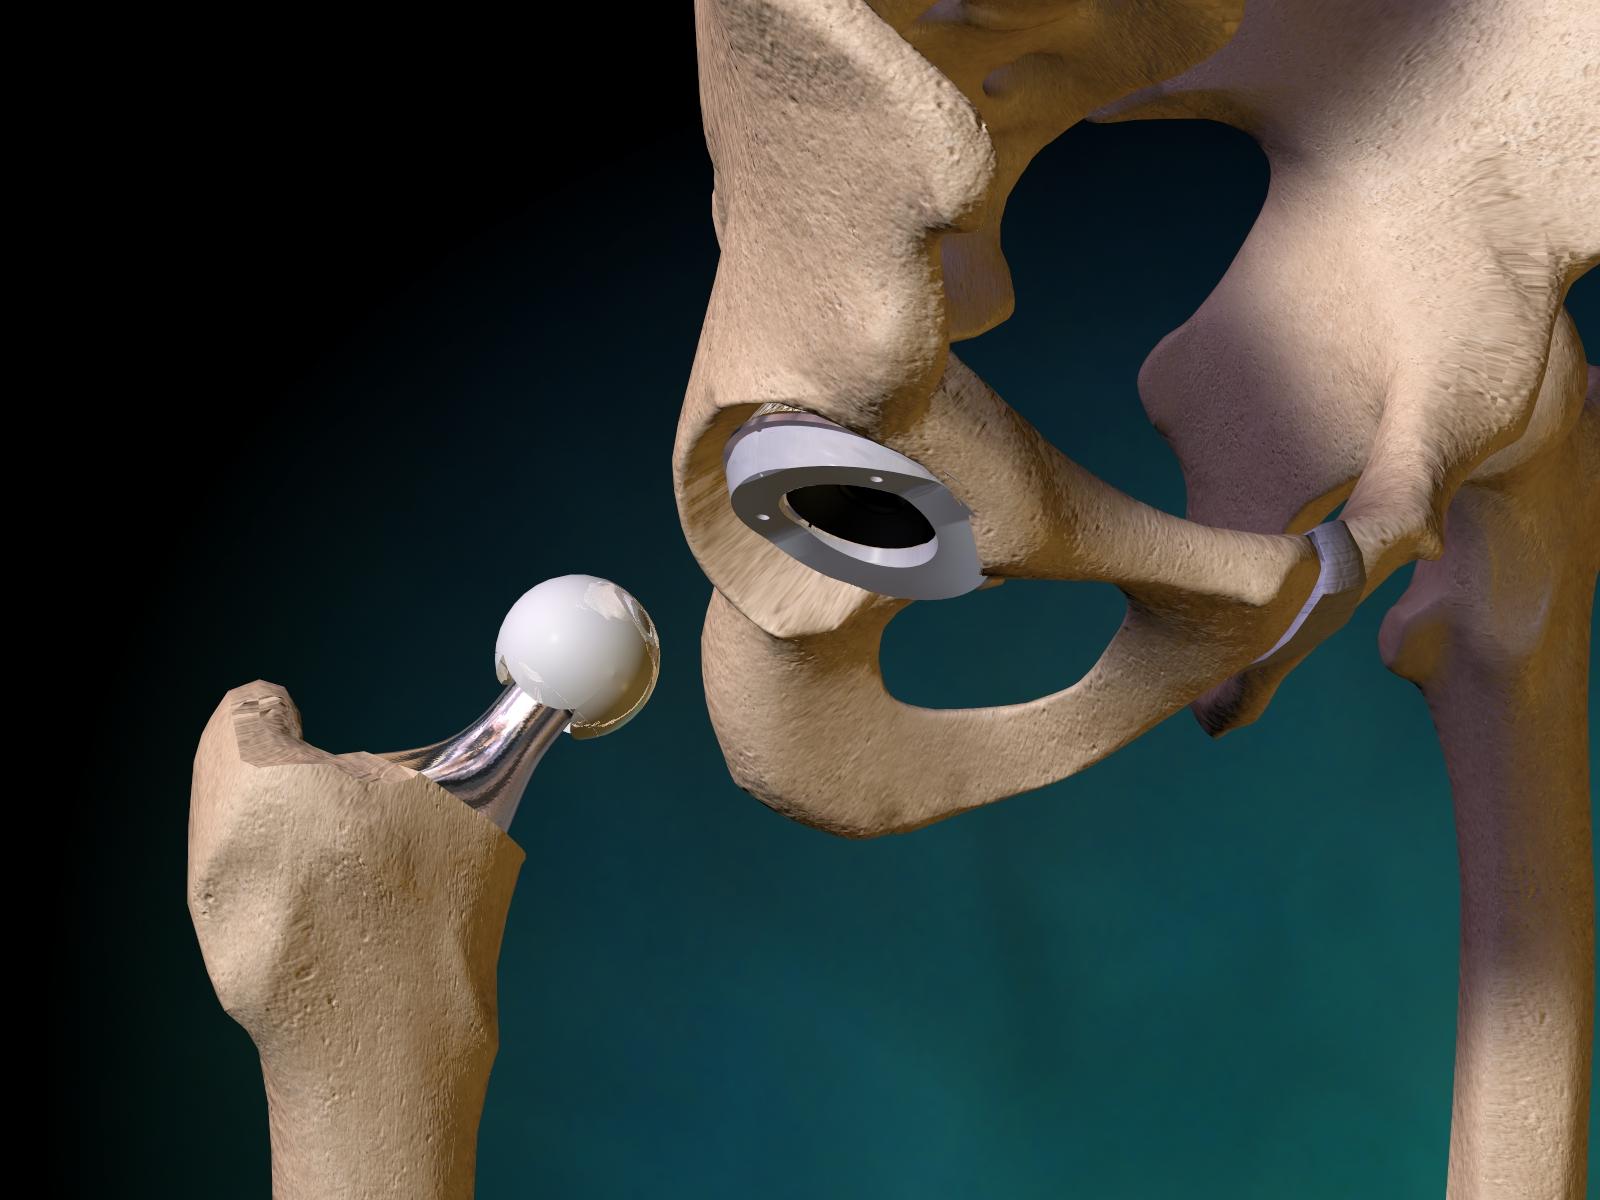 повторная замена эндопротеза тазобедренного сустава